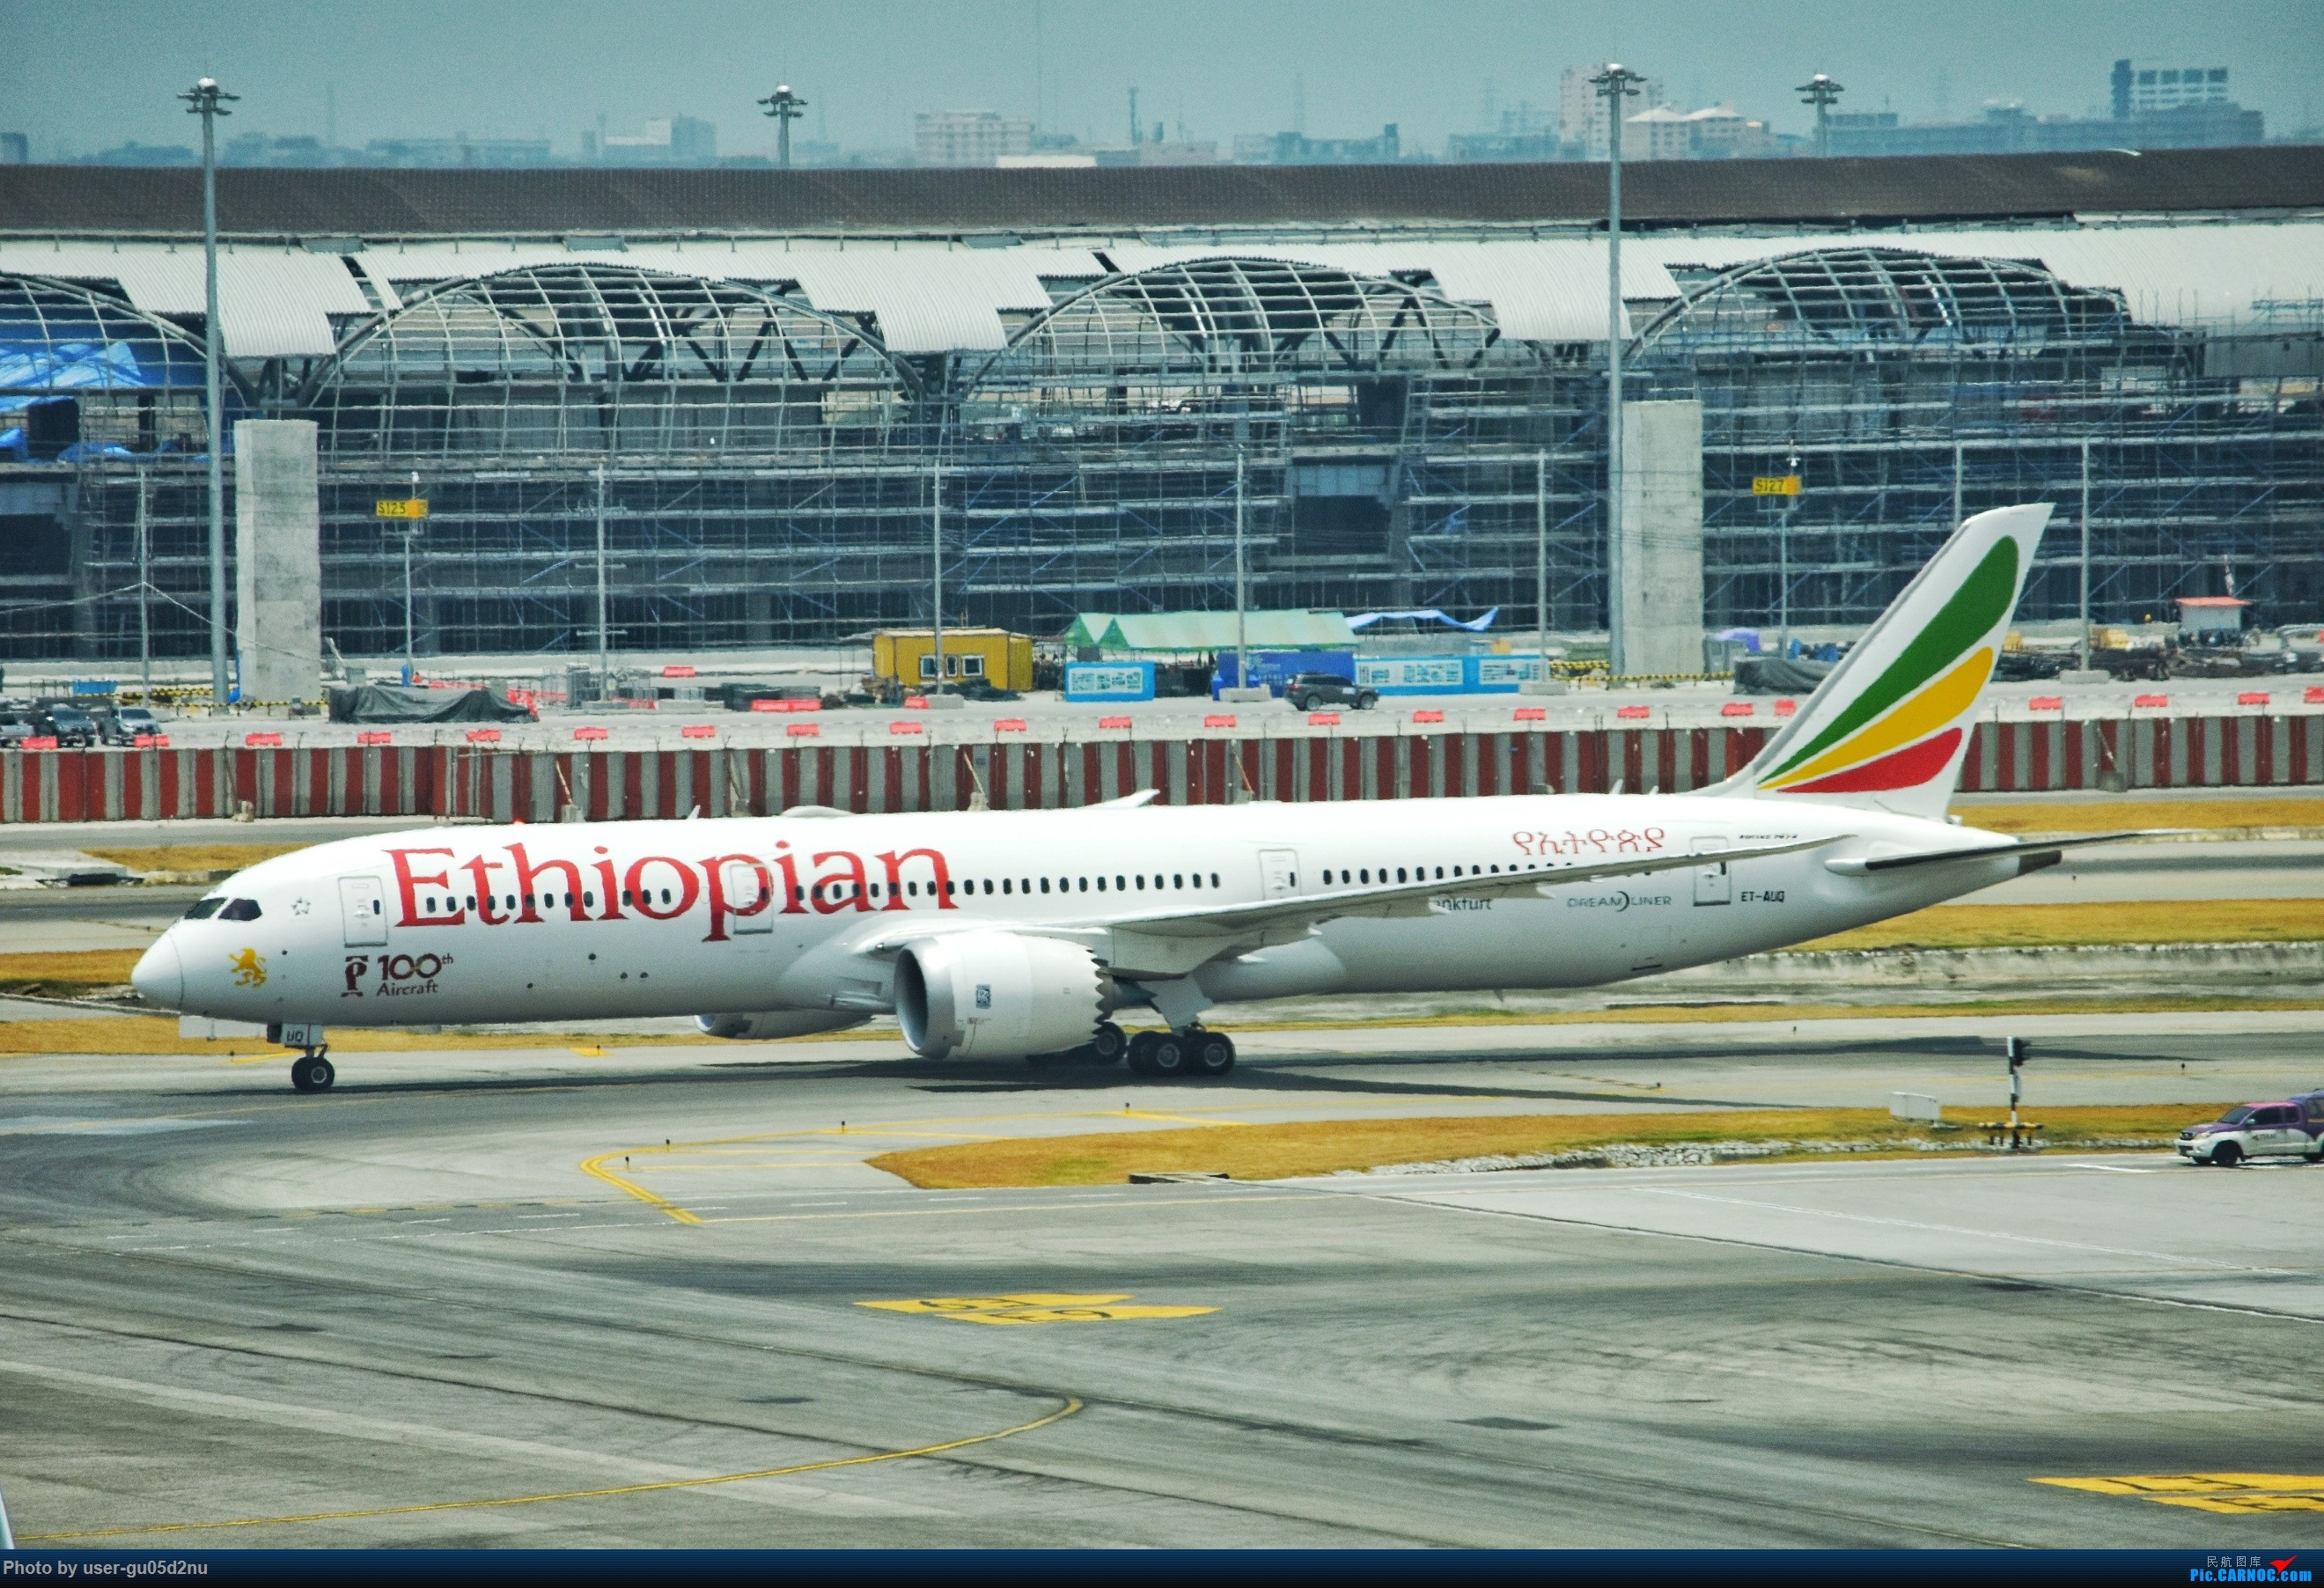 Re:[原创]曼谷素万那普观景平台视角【滑行篇】 BOEING 787-9 ET-AUQ Suvarnabhumi Airport